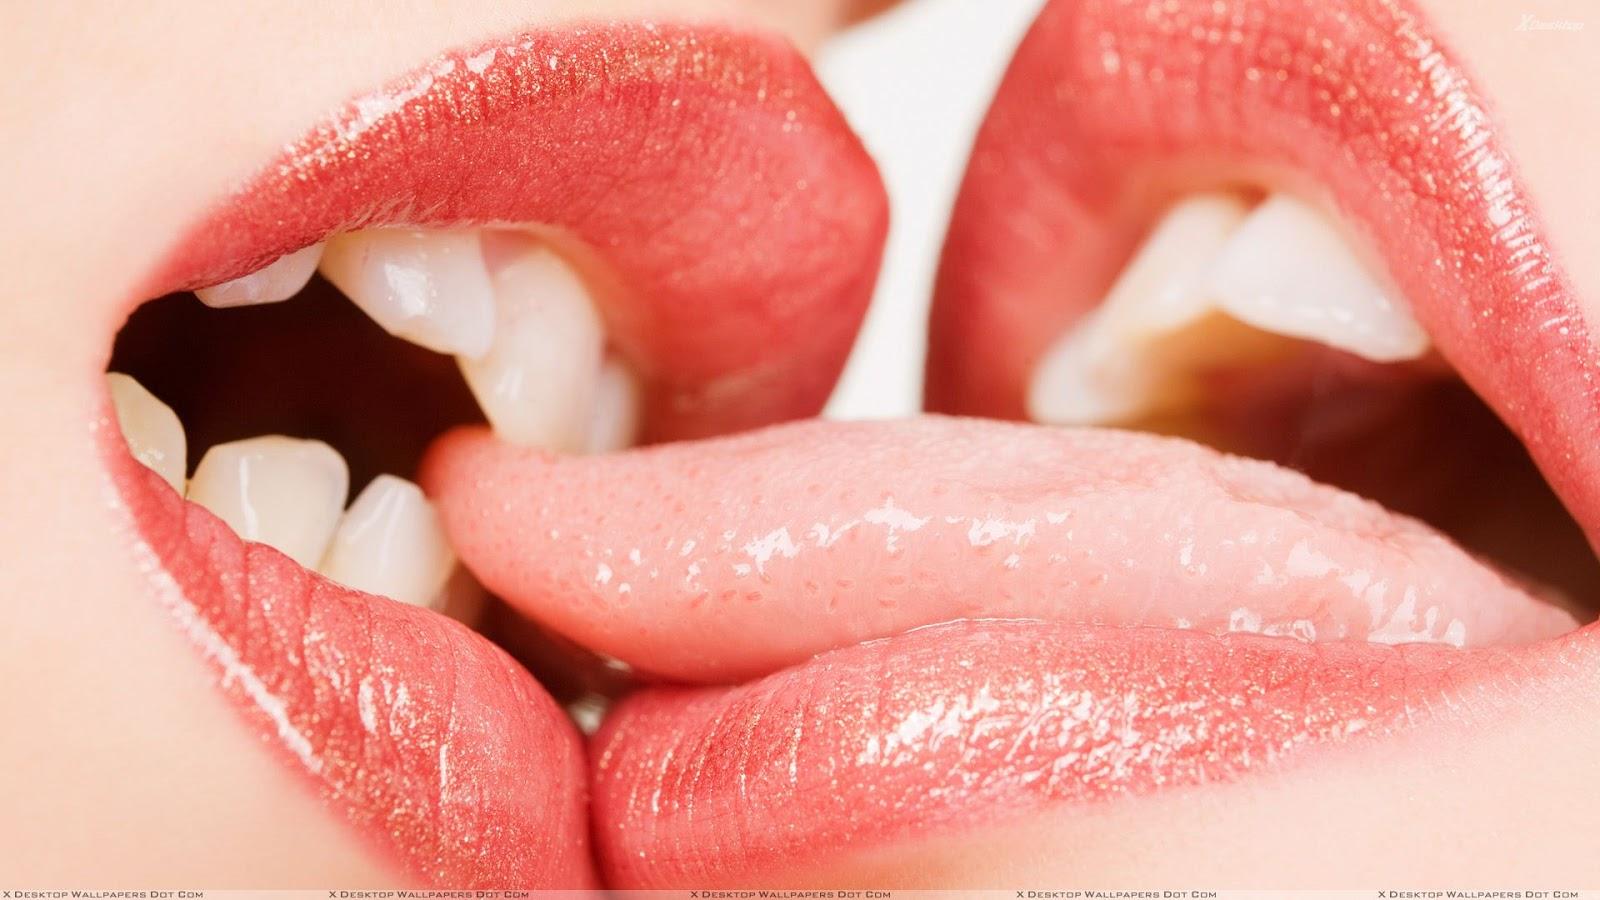 top Kissing wallpaper hd 2013.jpg